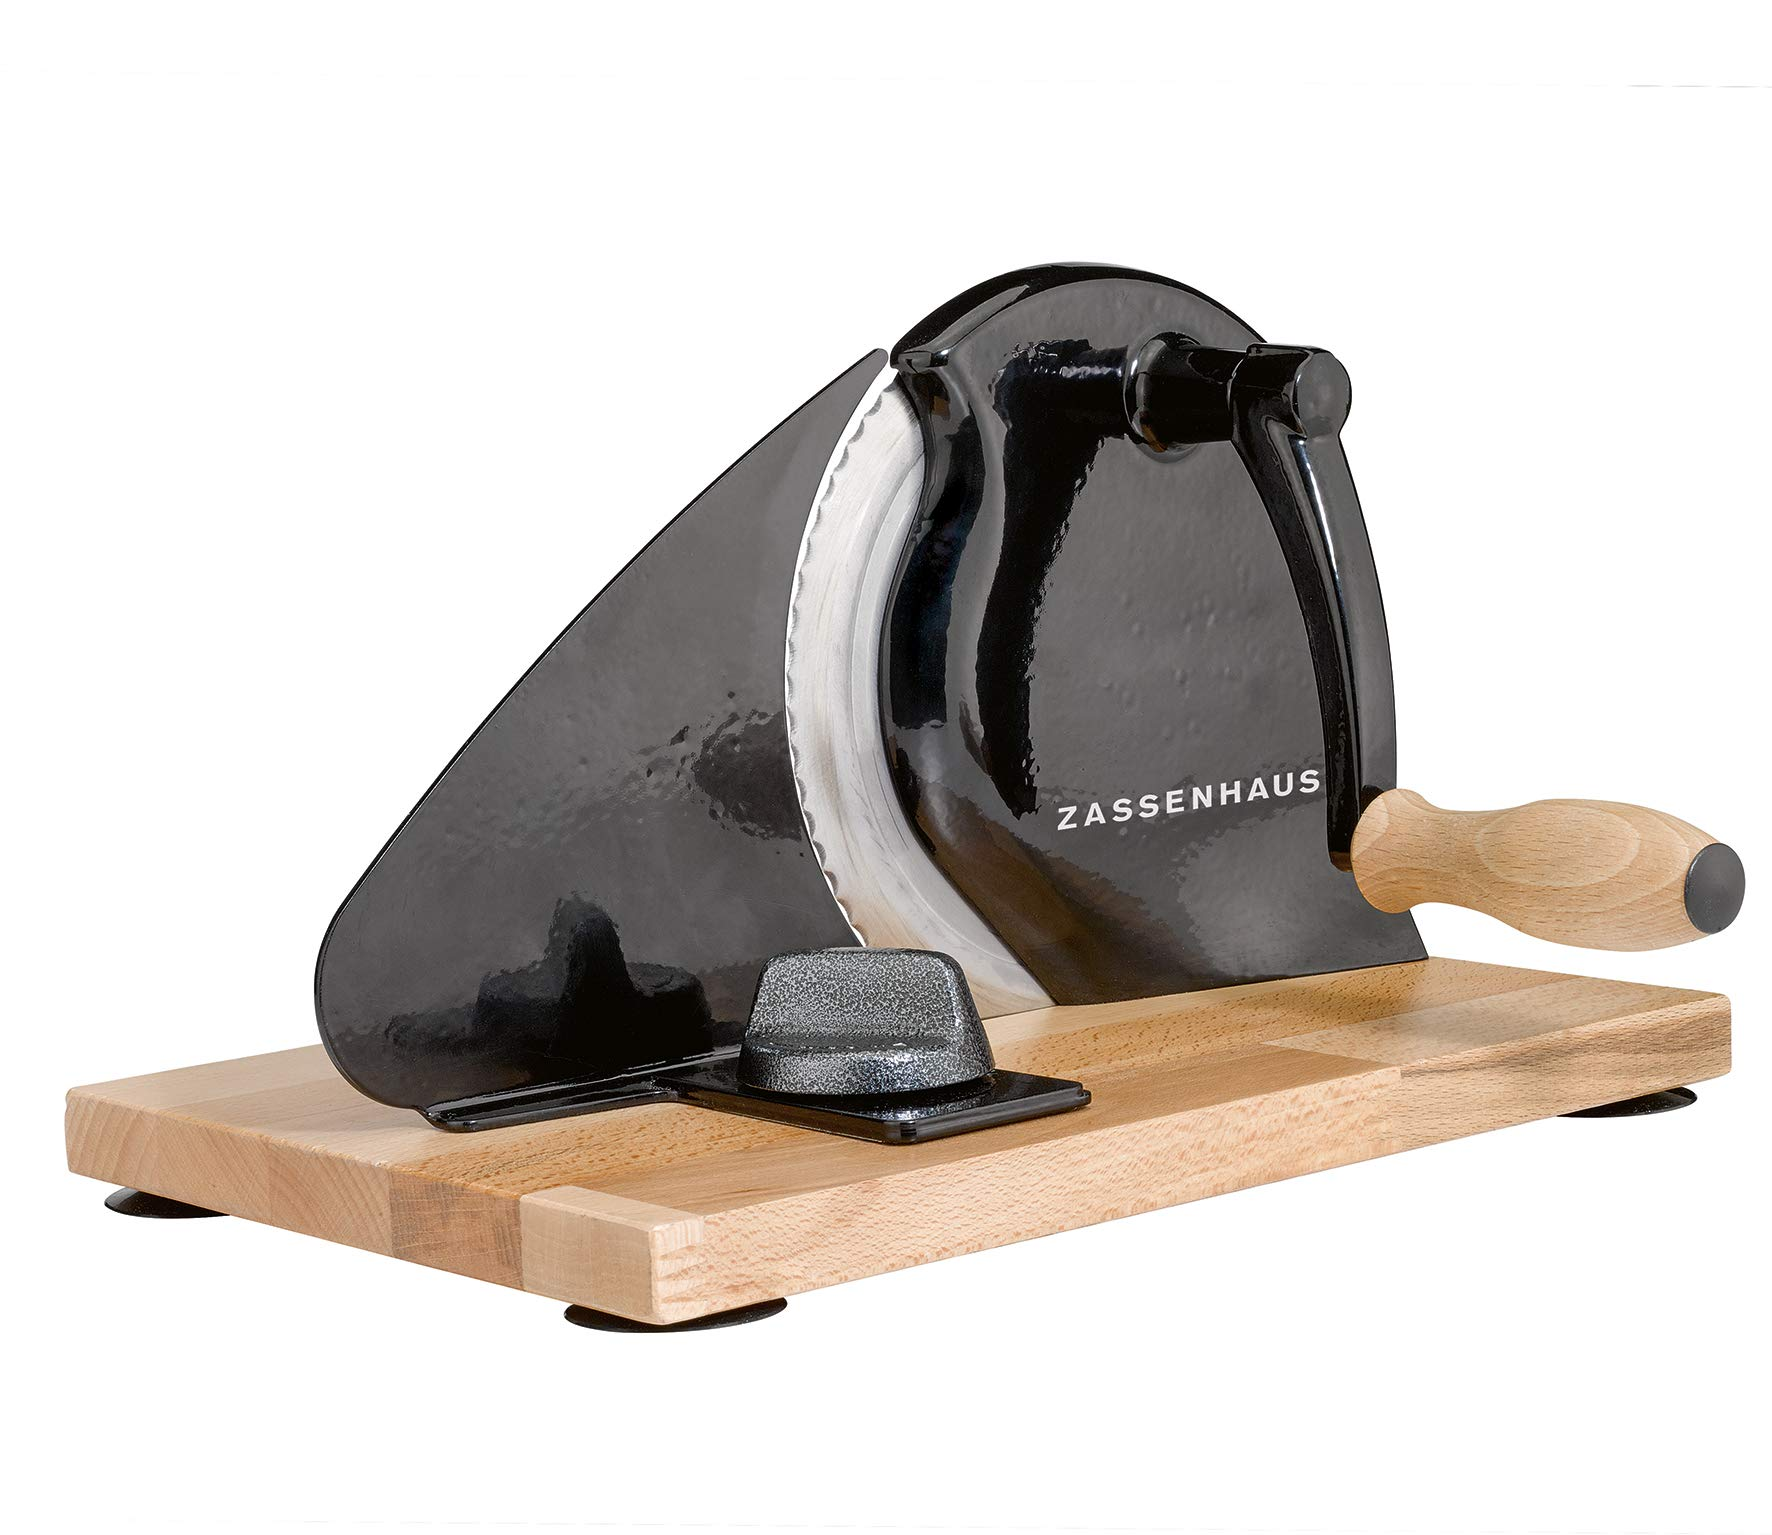 Zassenhaus Classic Bread Slicer, Manual, Black by Zassenhaus